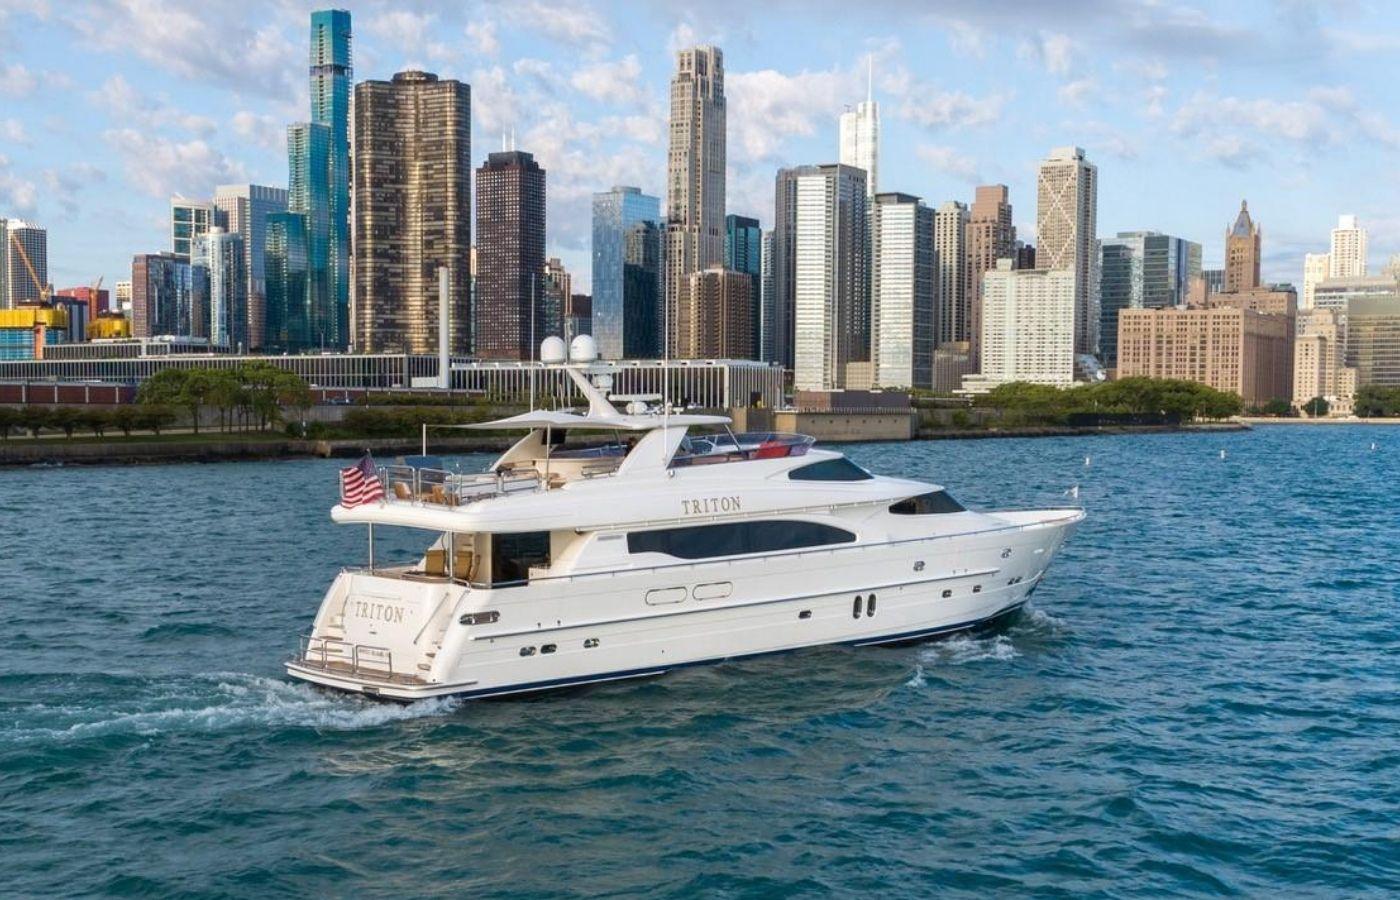 95 Horizon Motor Yacht Sold By David Johnson